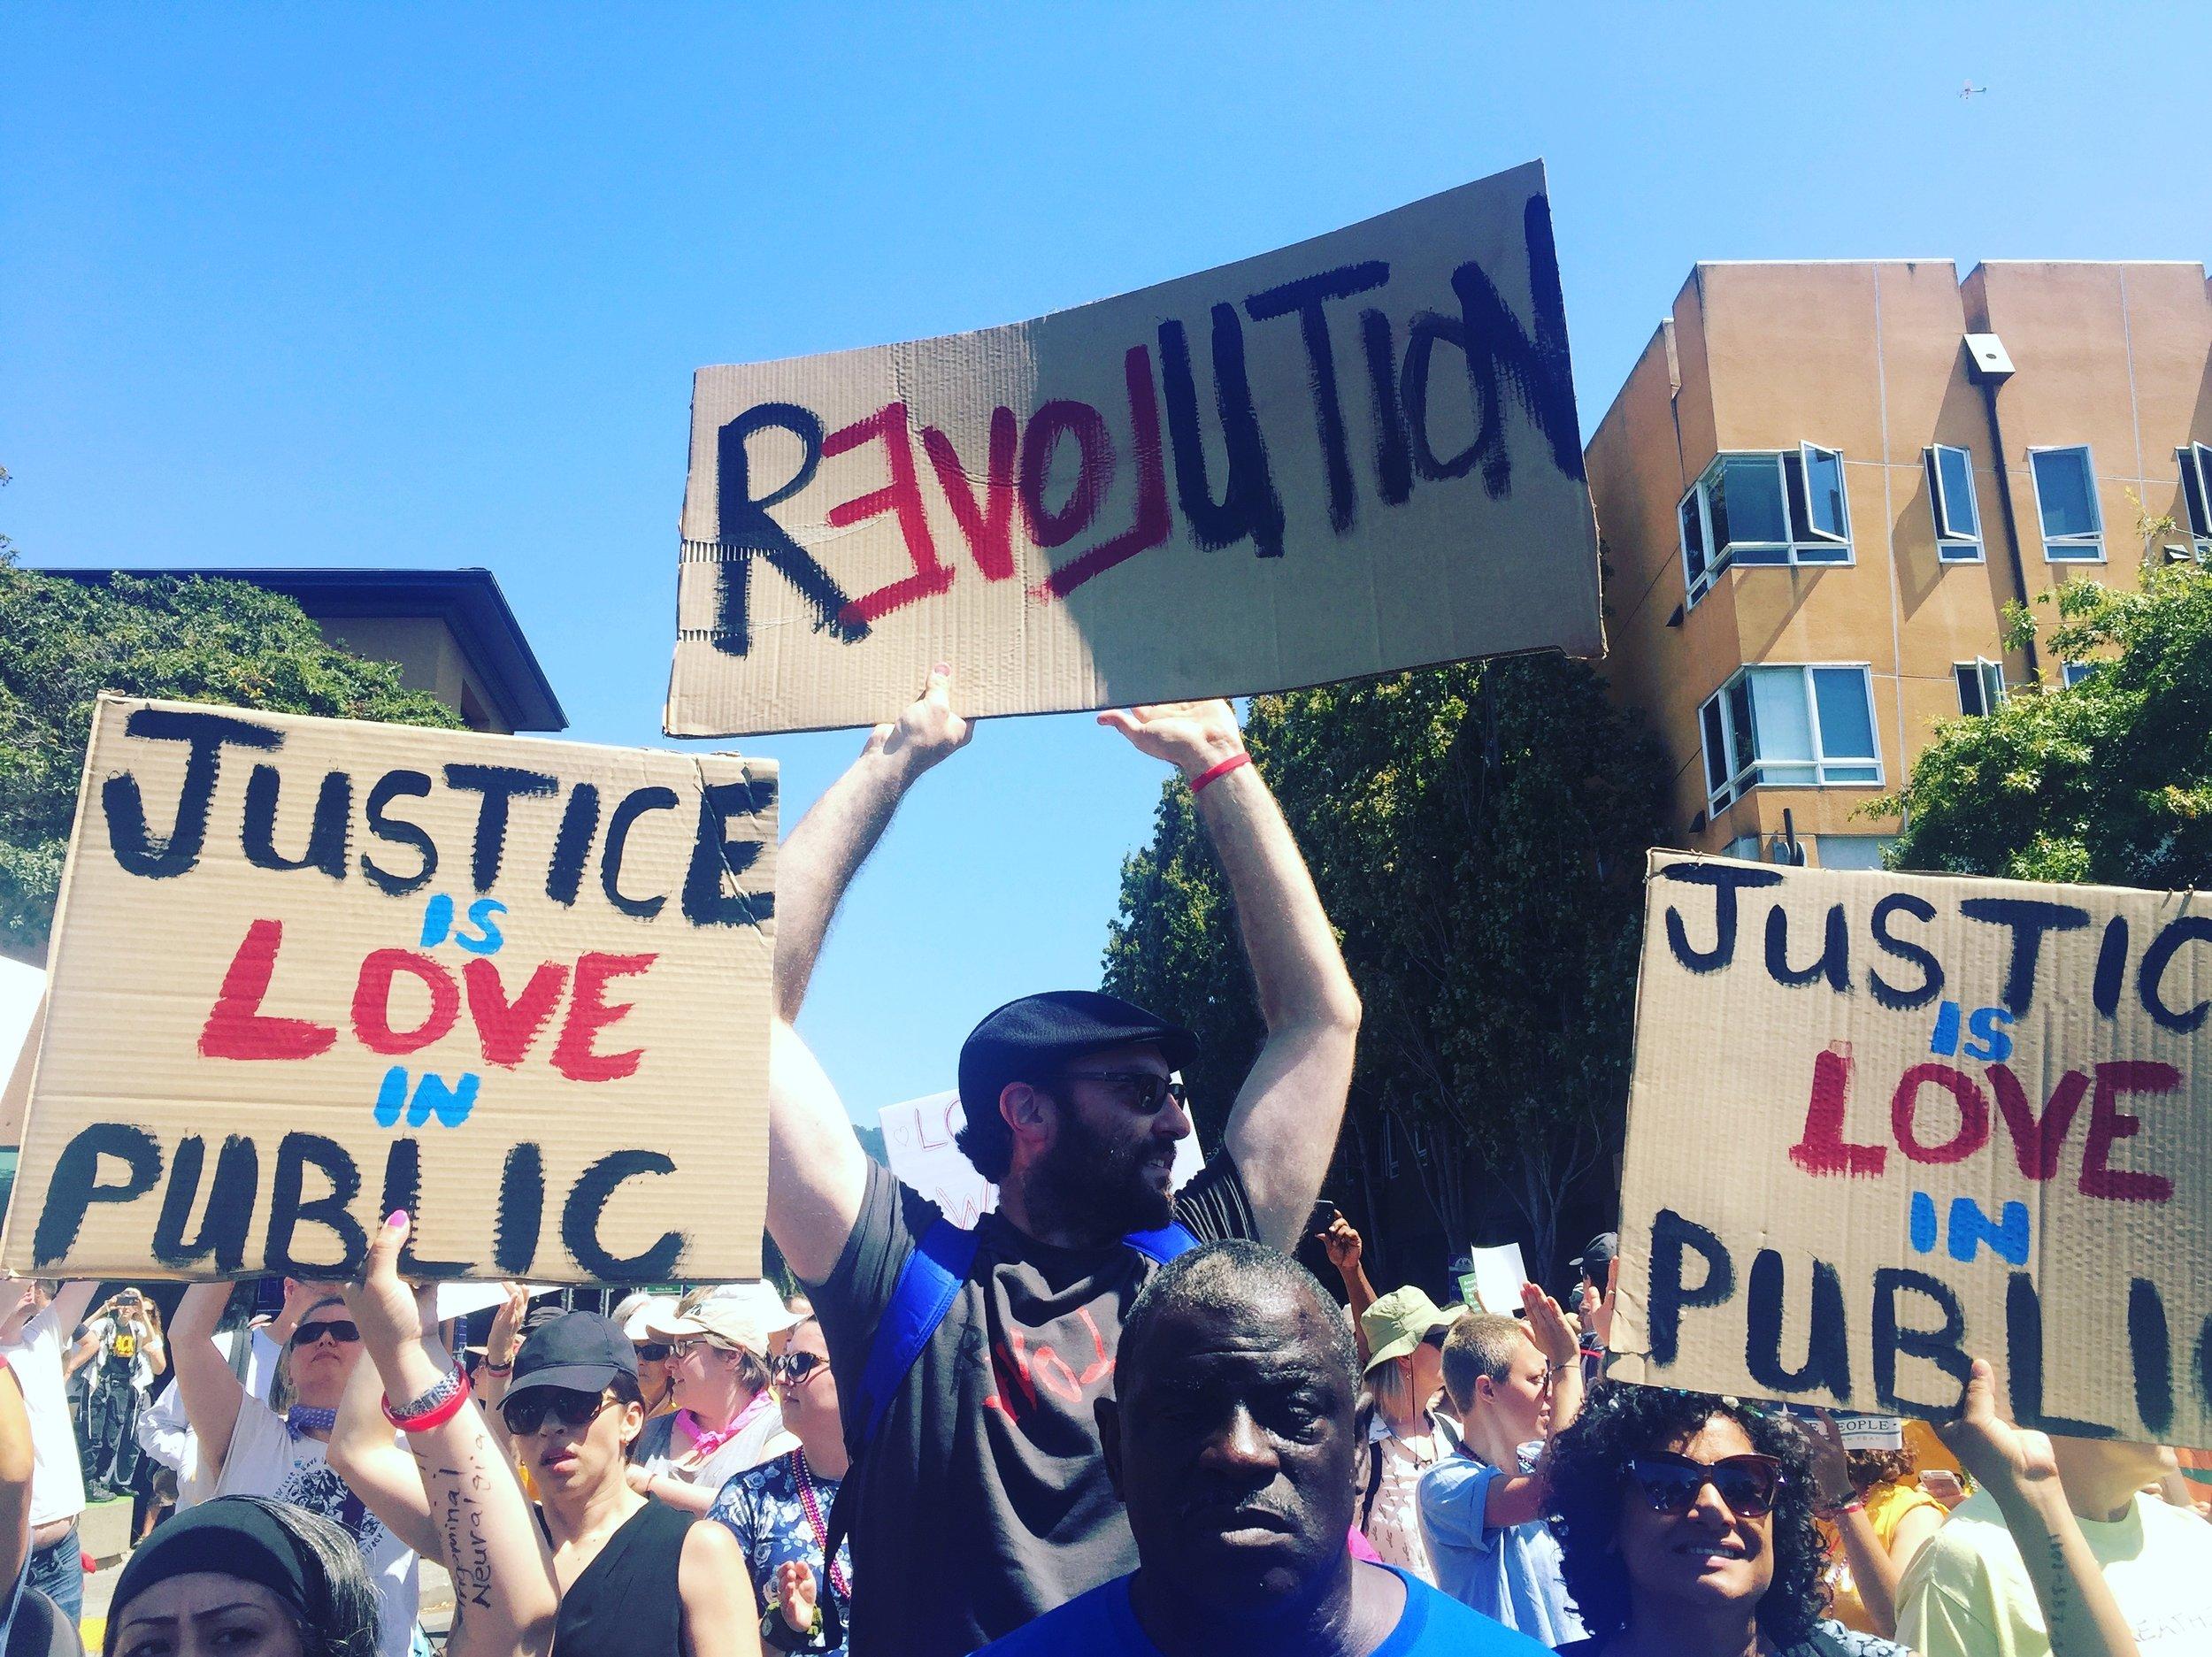 August 2017. Berkeley, California.